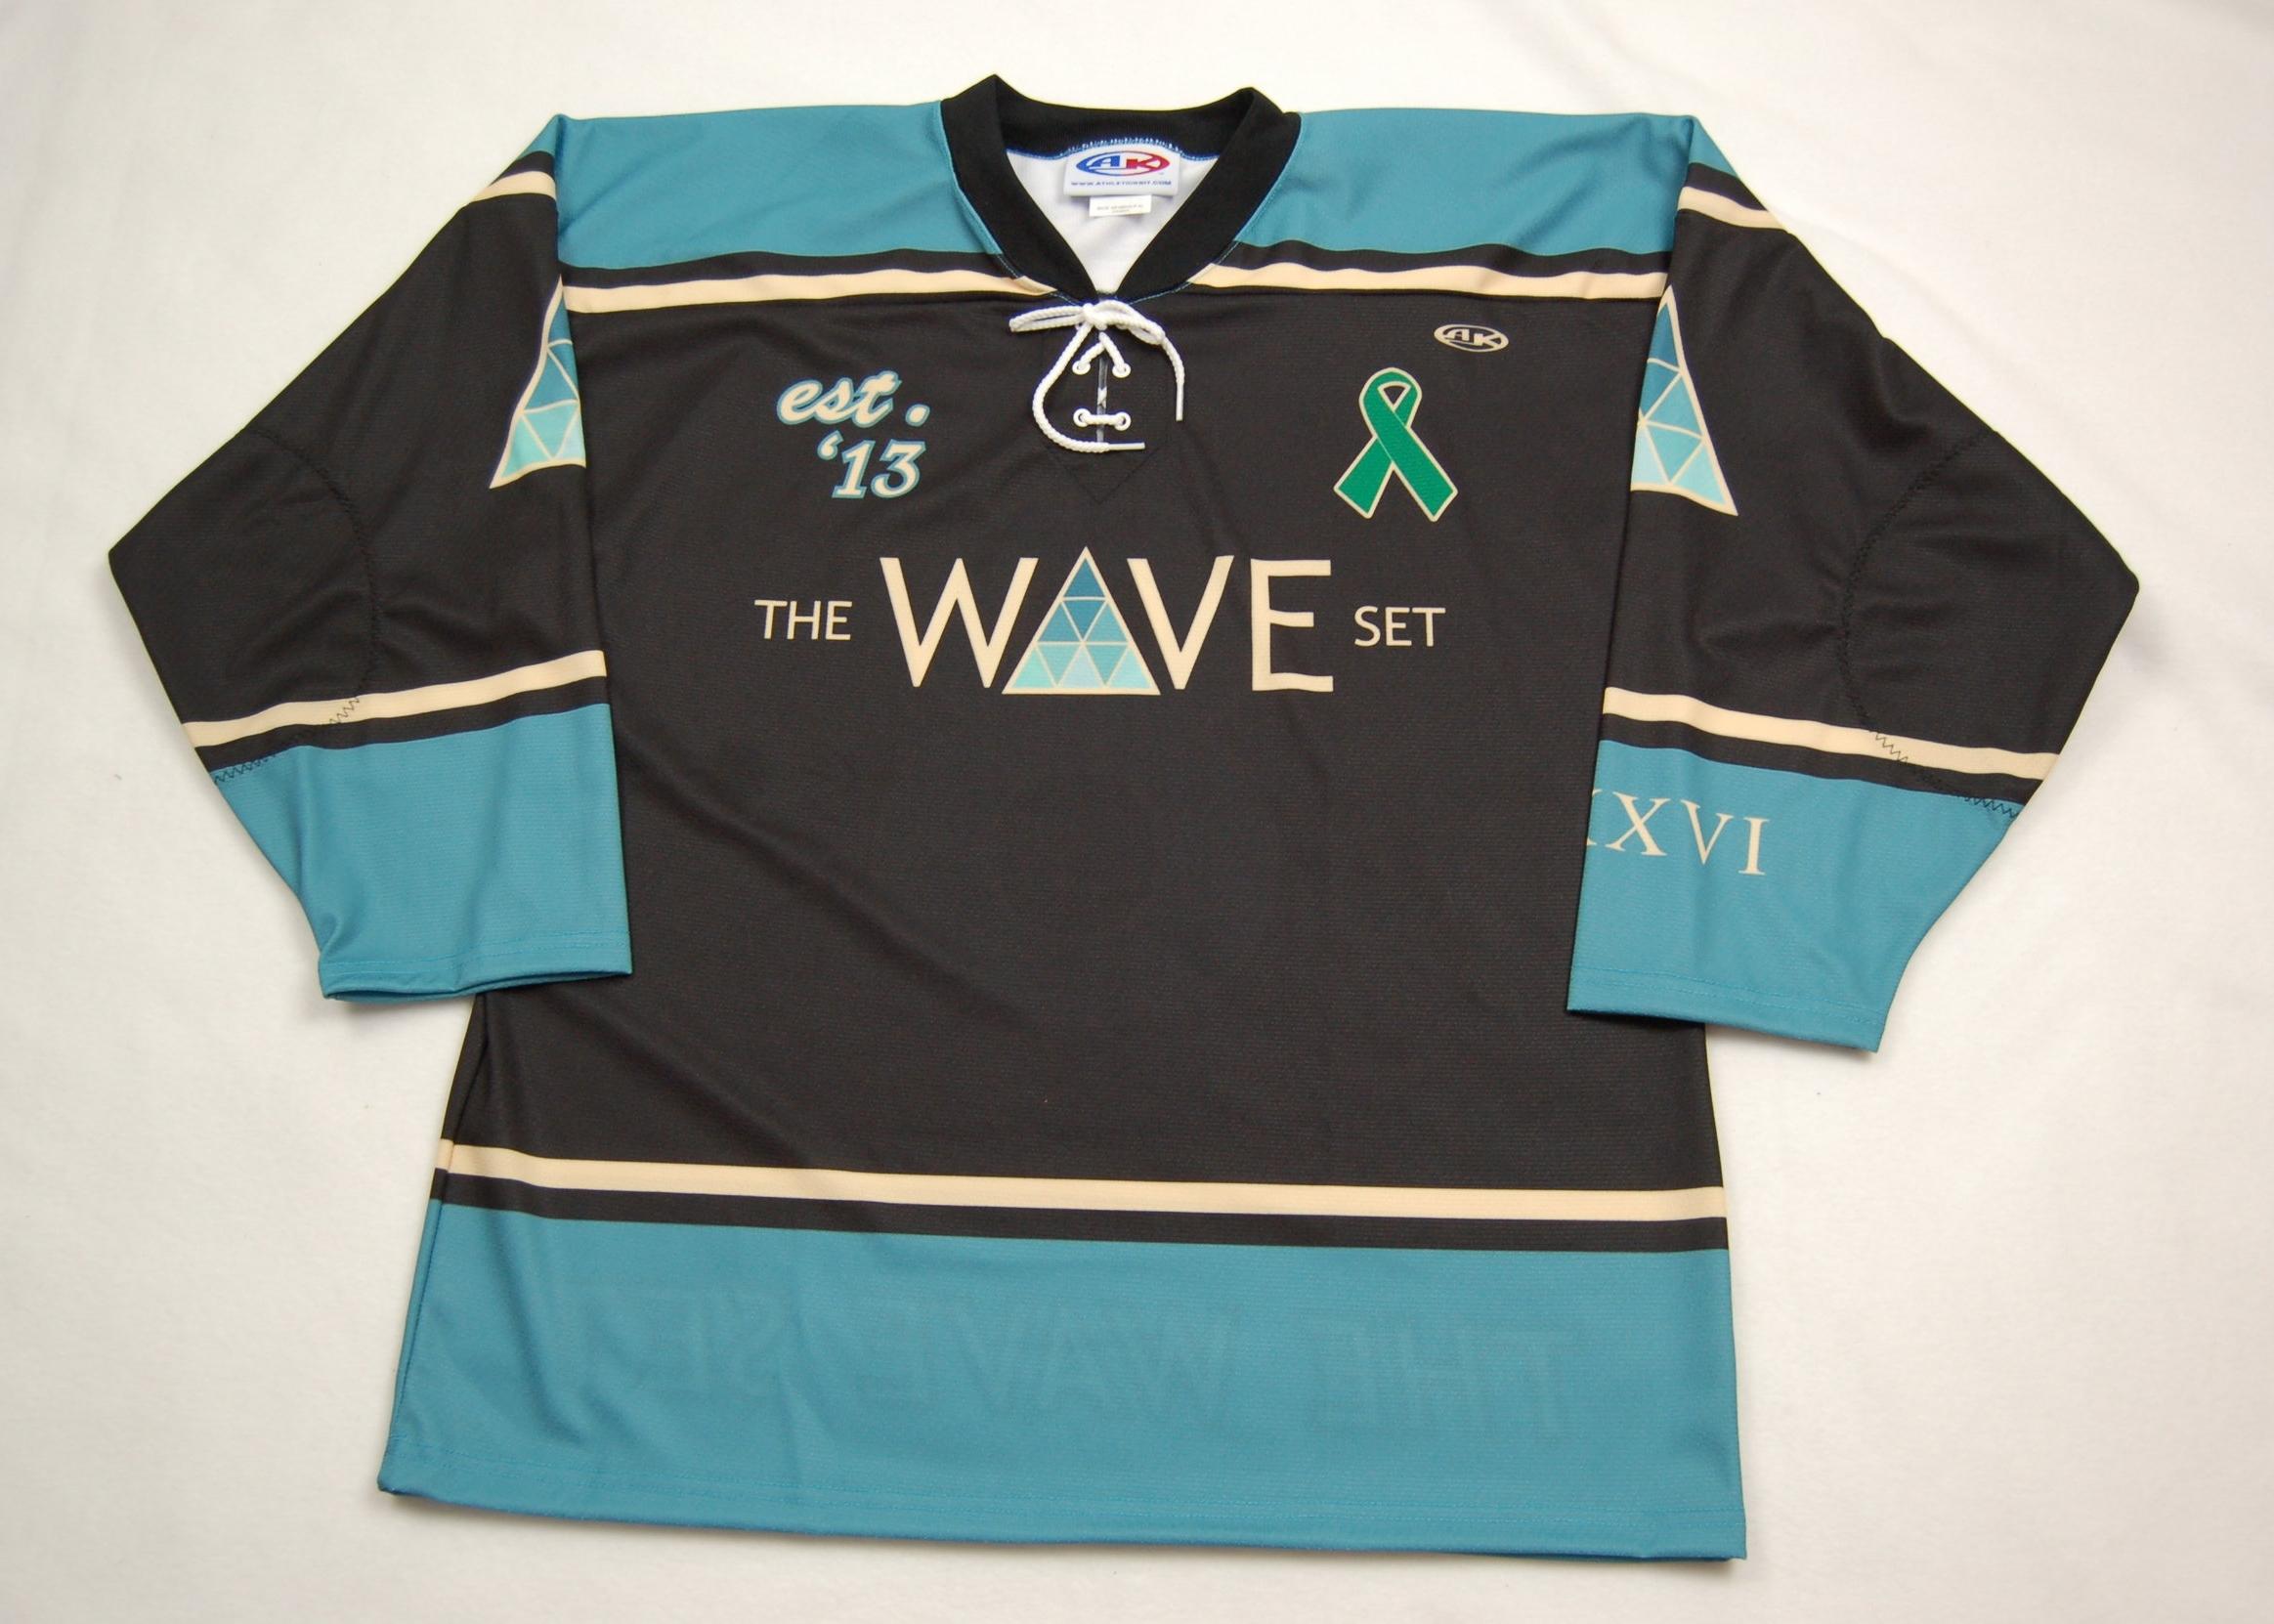 The Wave Set